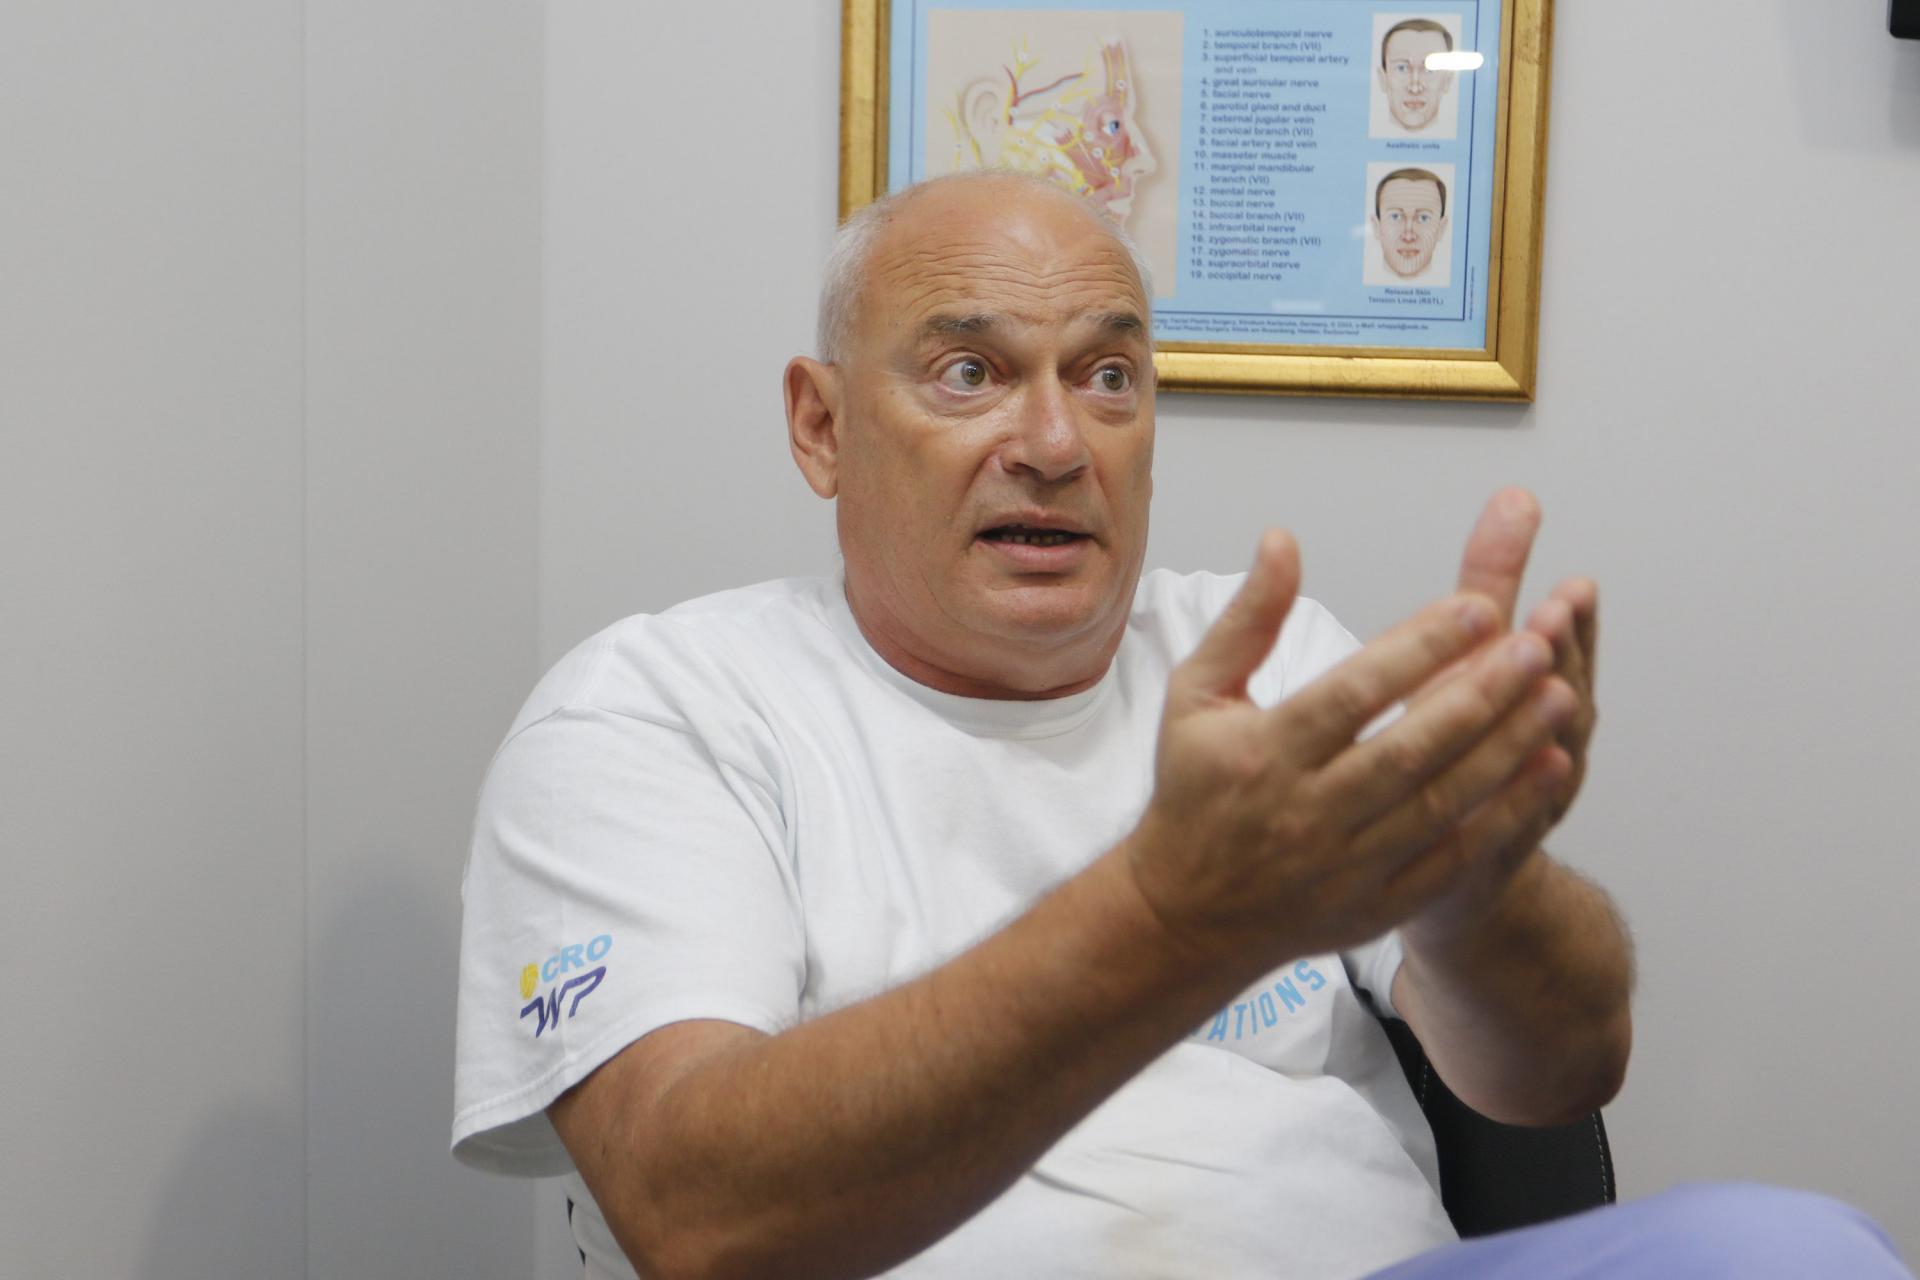 Dr. Branko Glušac